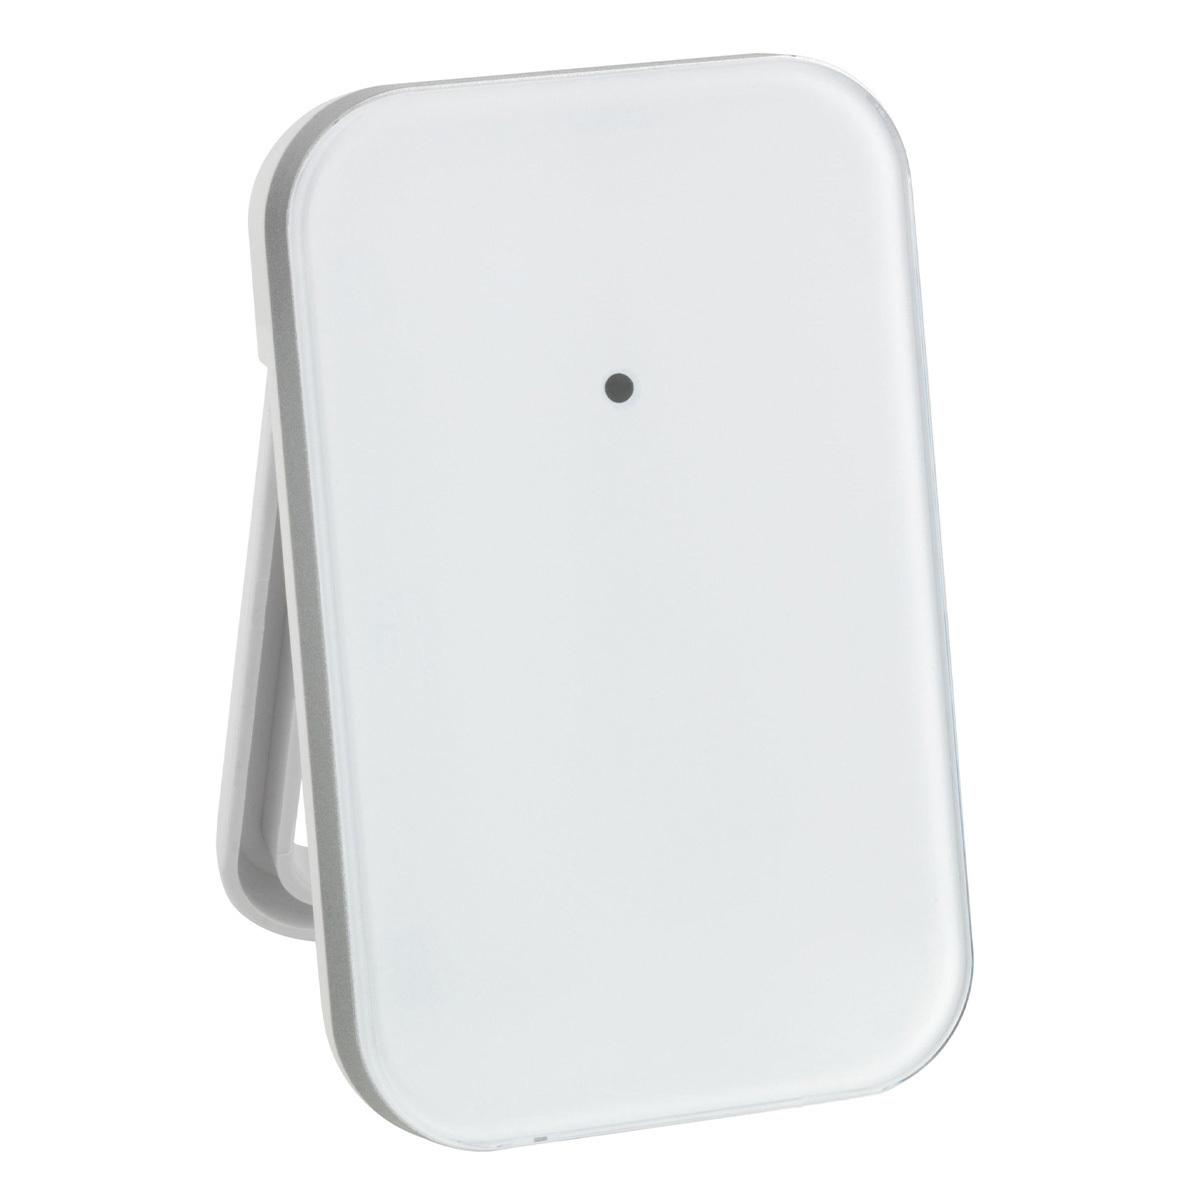 30-3198-thermo-hygro-sender-1200x200px.jpg